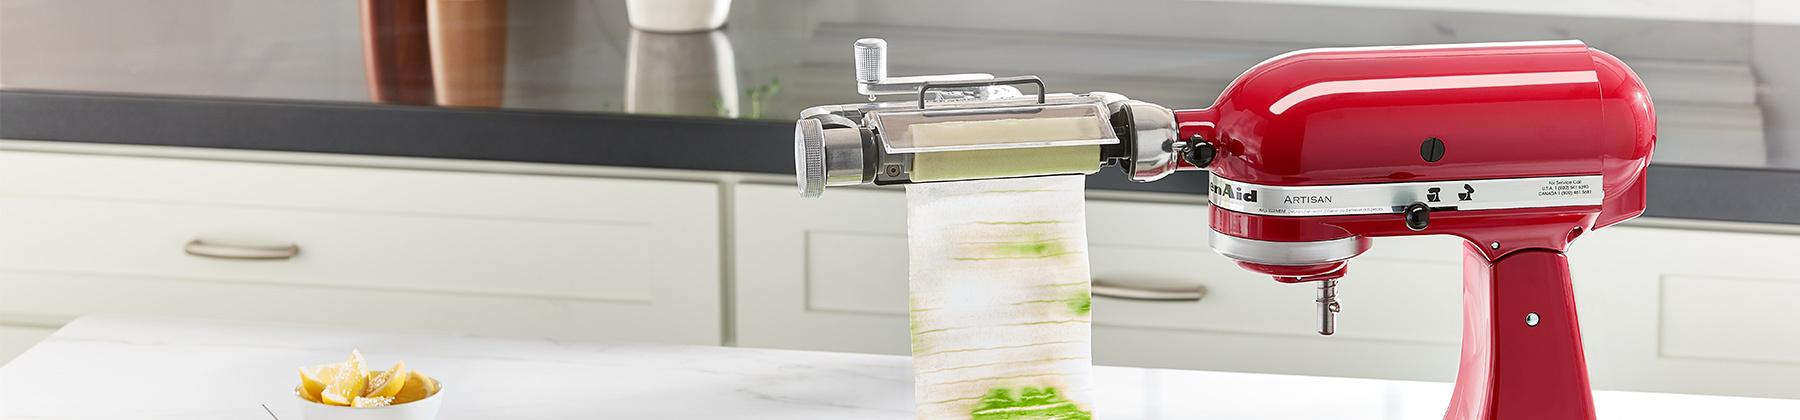 Photo of a KitchenAid Sheet Cutter Attachment cutting cucumber on a KitchenAid mixer.